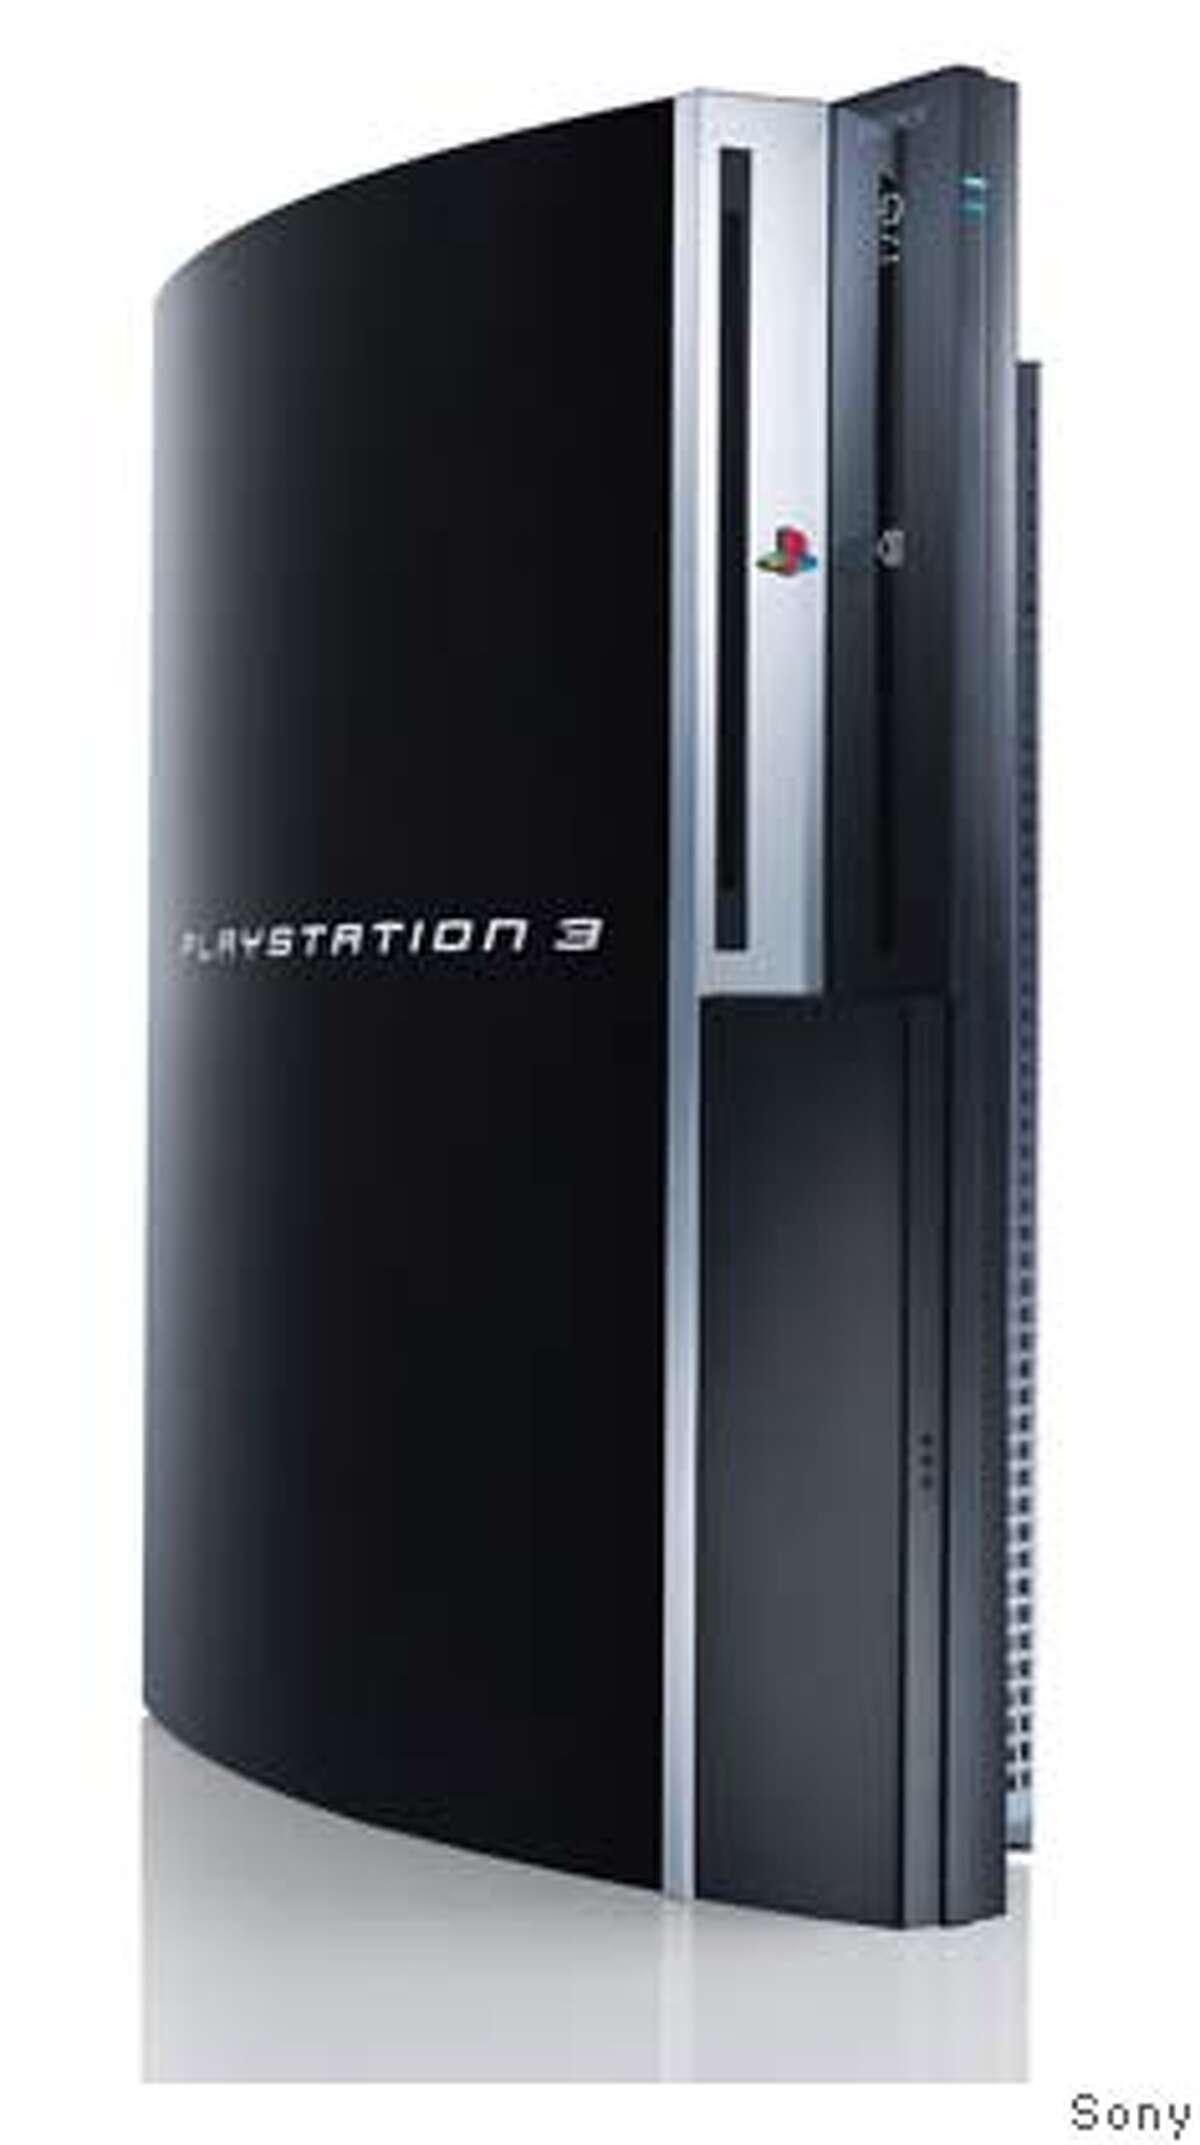 PS3Vert.jpg Sony Playstation 3. Sony / Courtesy to The Chronicle